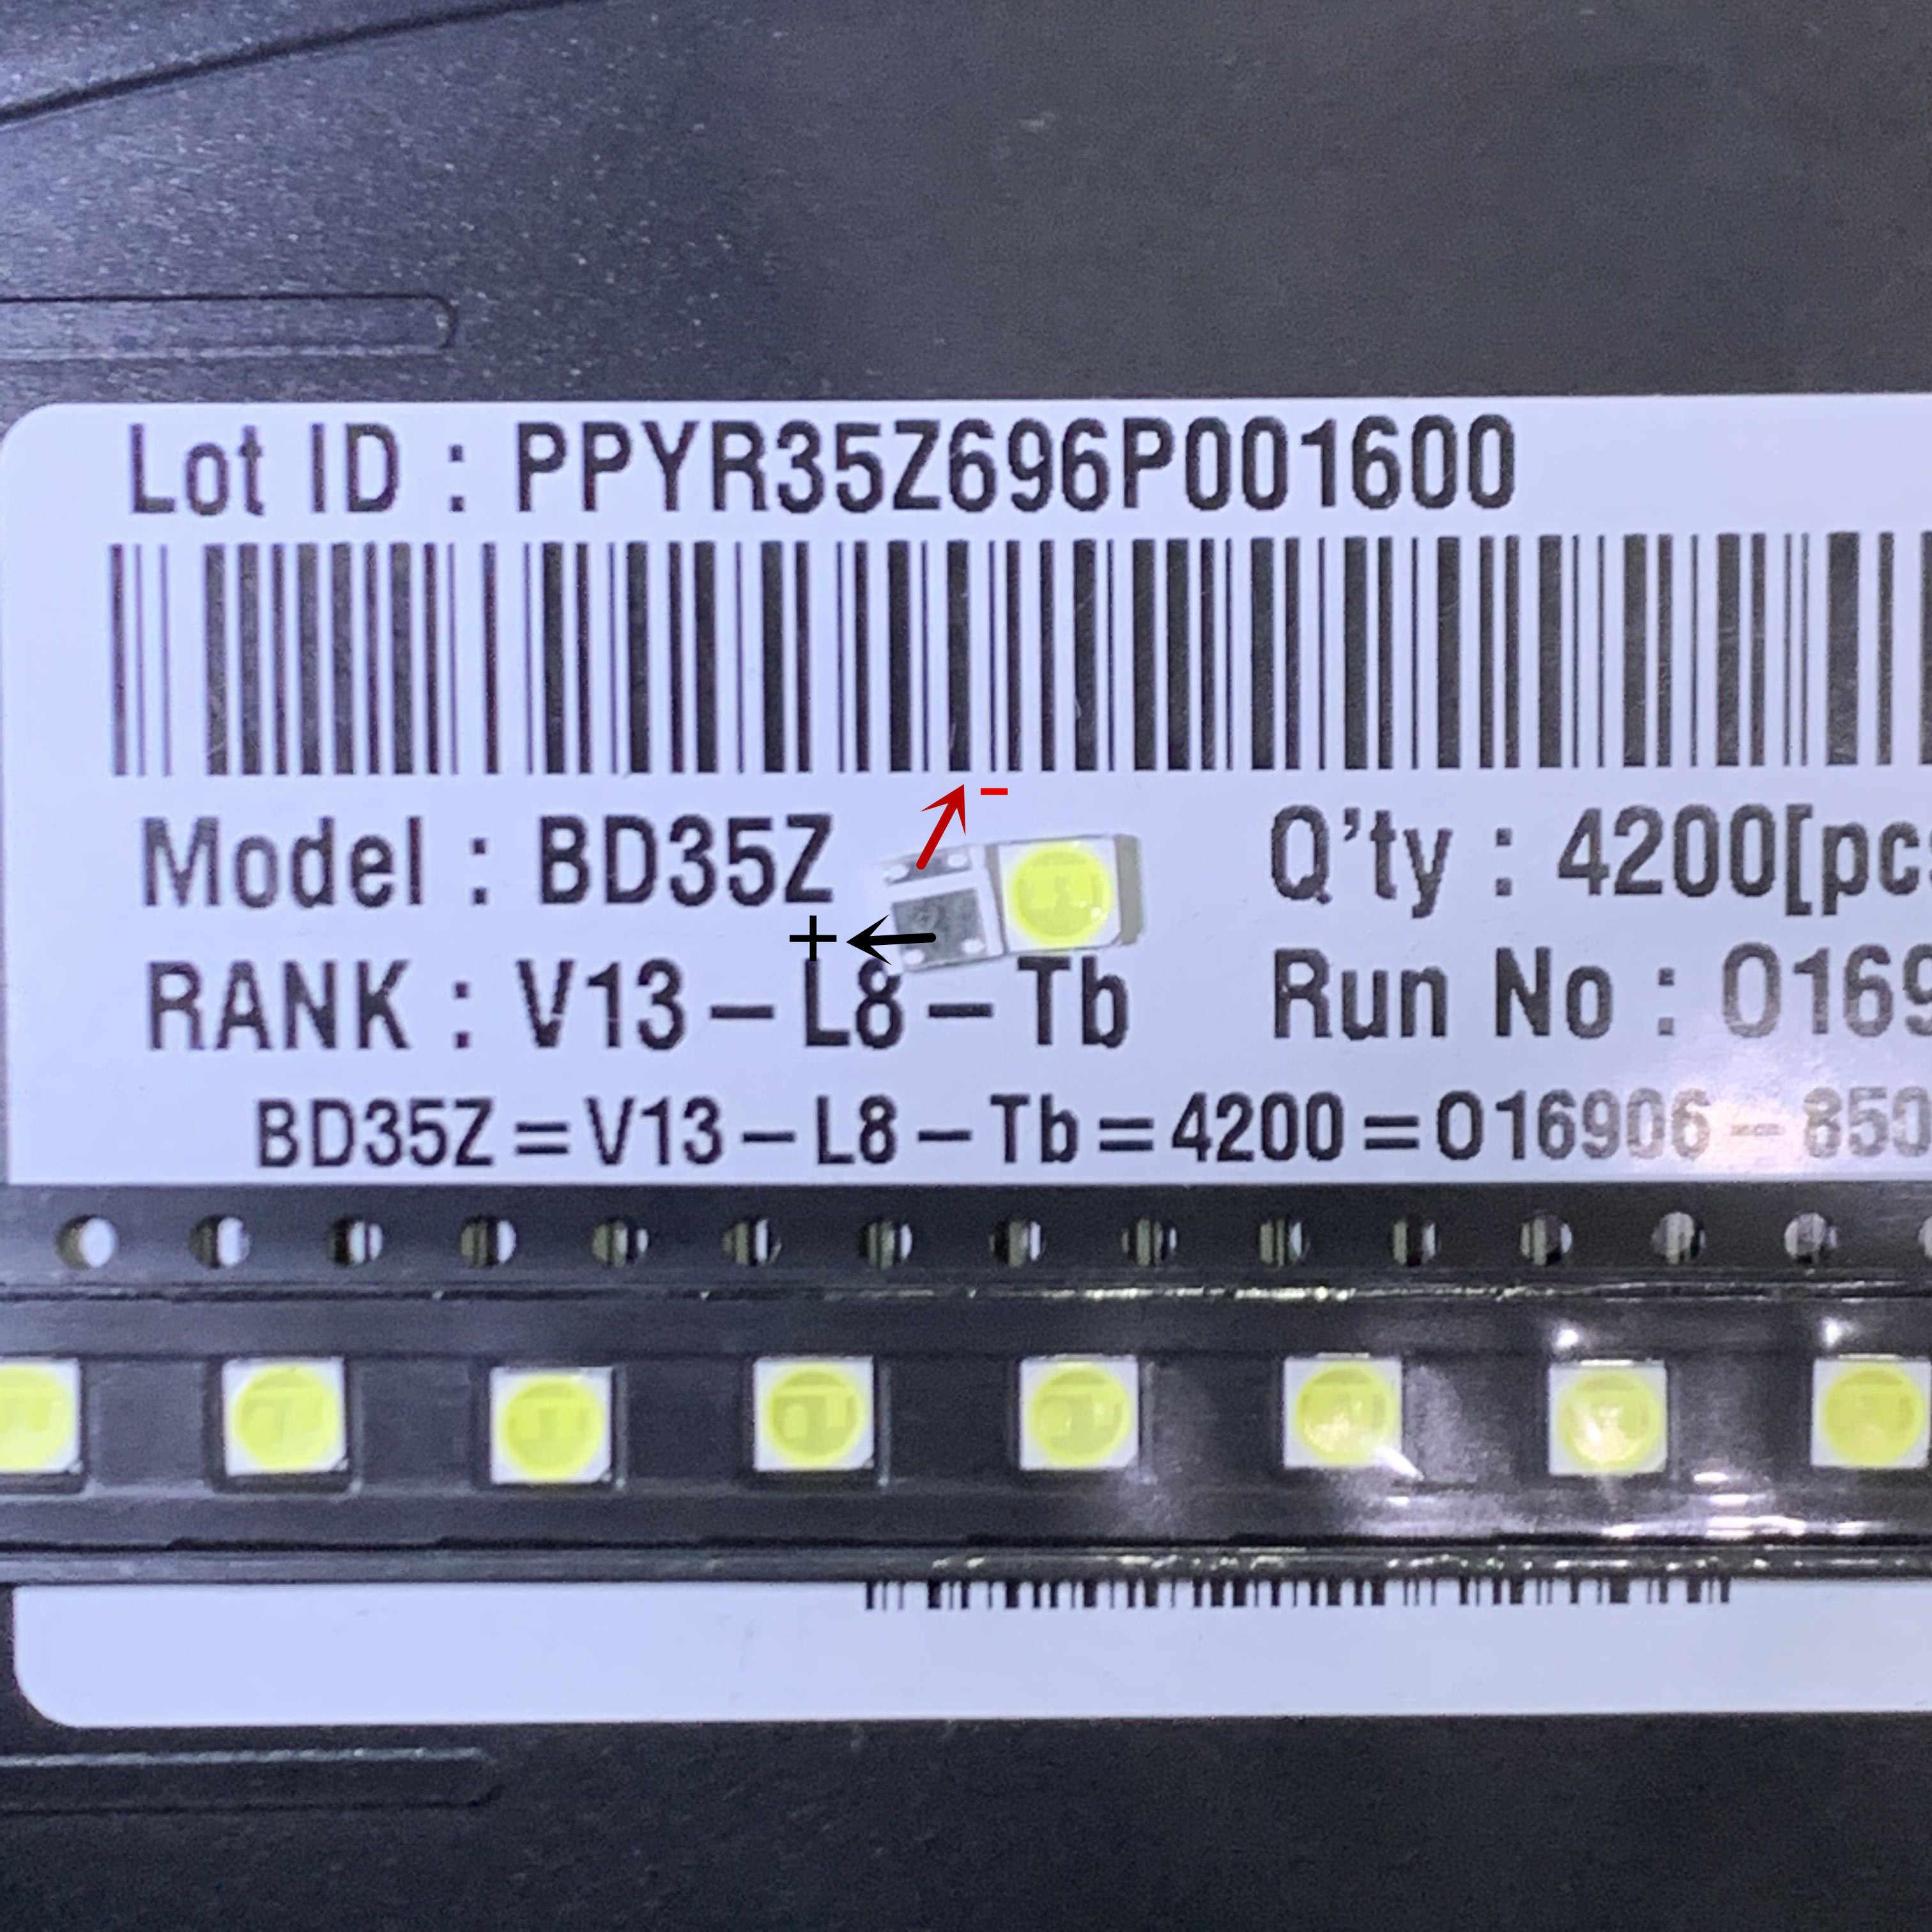 50 Uds. Para reparación de TV LCD, luces de tira de retroiluminación LG led TV con diodo emisor de luz 3535 SMD, cuentas LED 6V